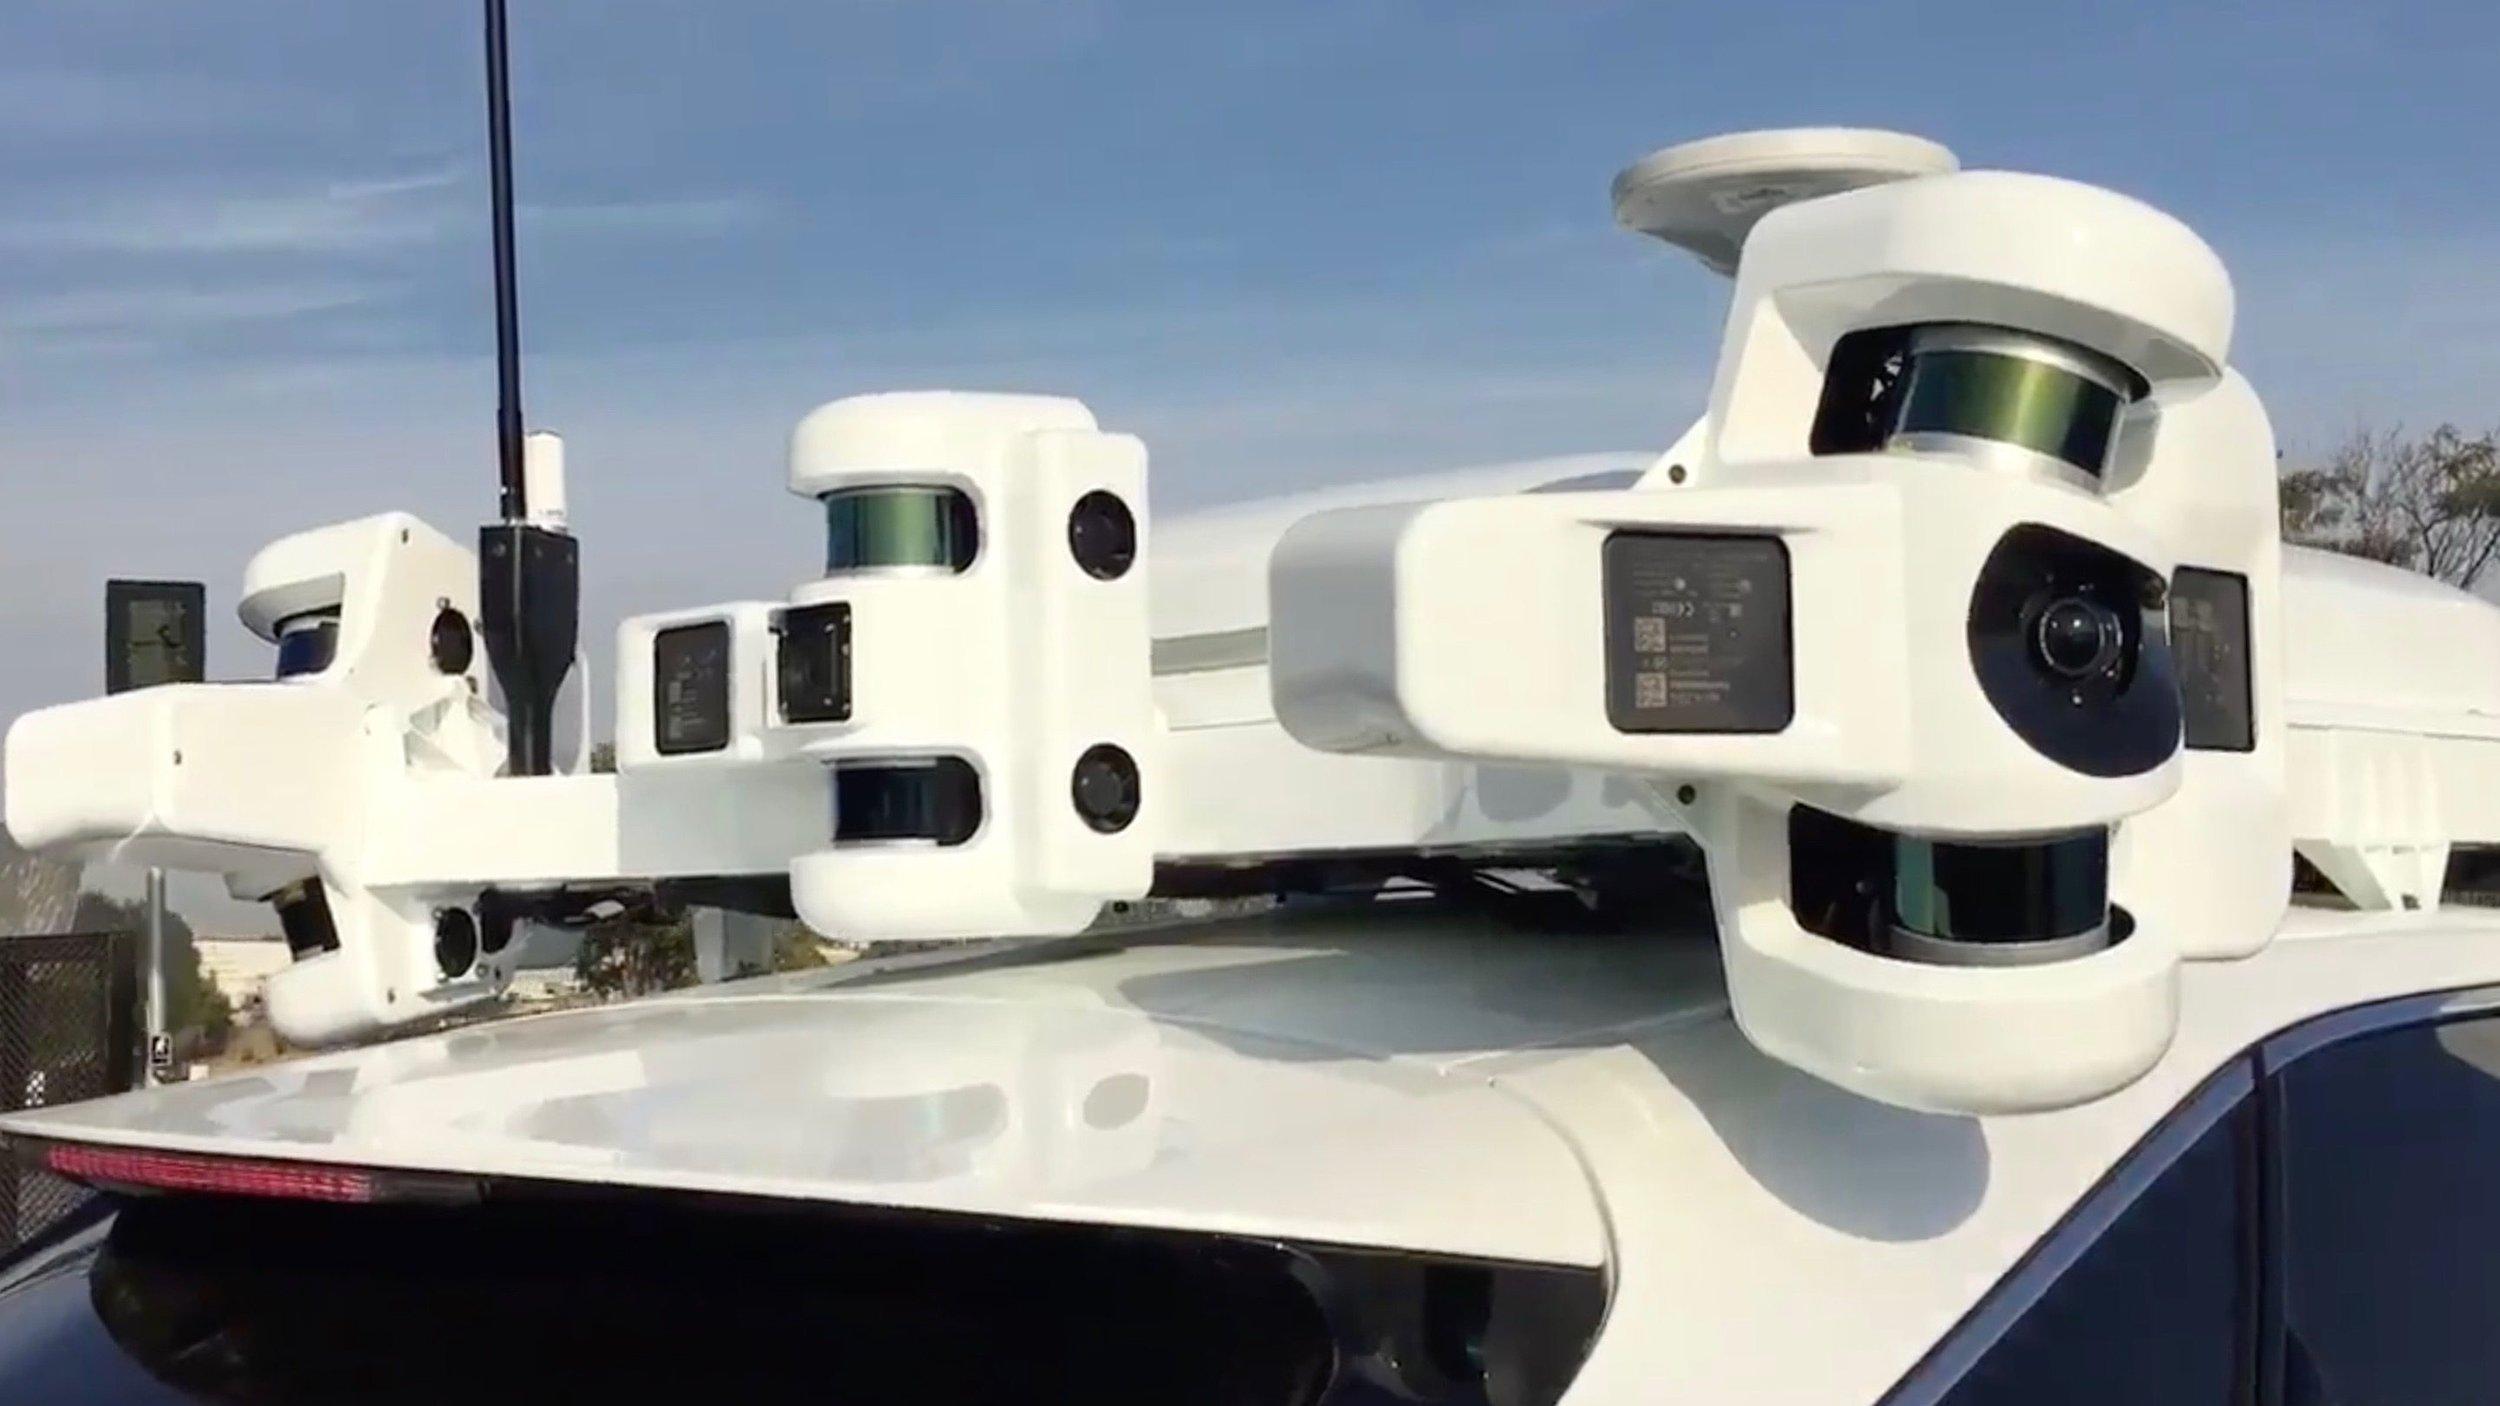 apple-car-project-titan-lidar.jpg